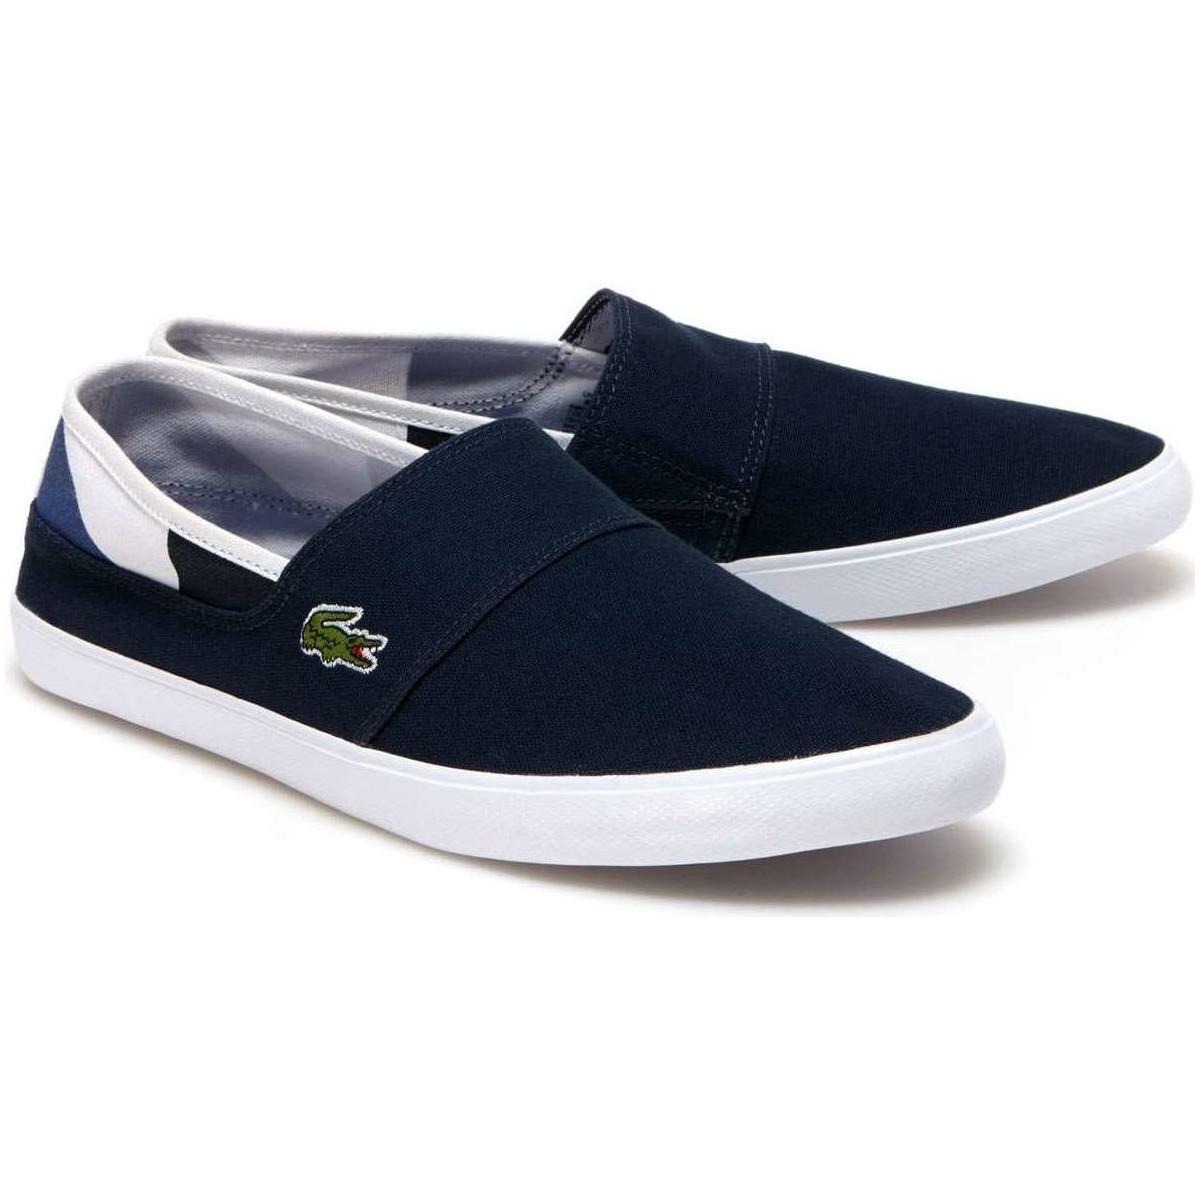 be4c9f216 Lacoste 733cam1068 Slip-on Man Blue Men s Slip-ons (shoes) In Blue ...